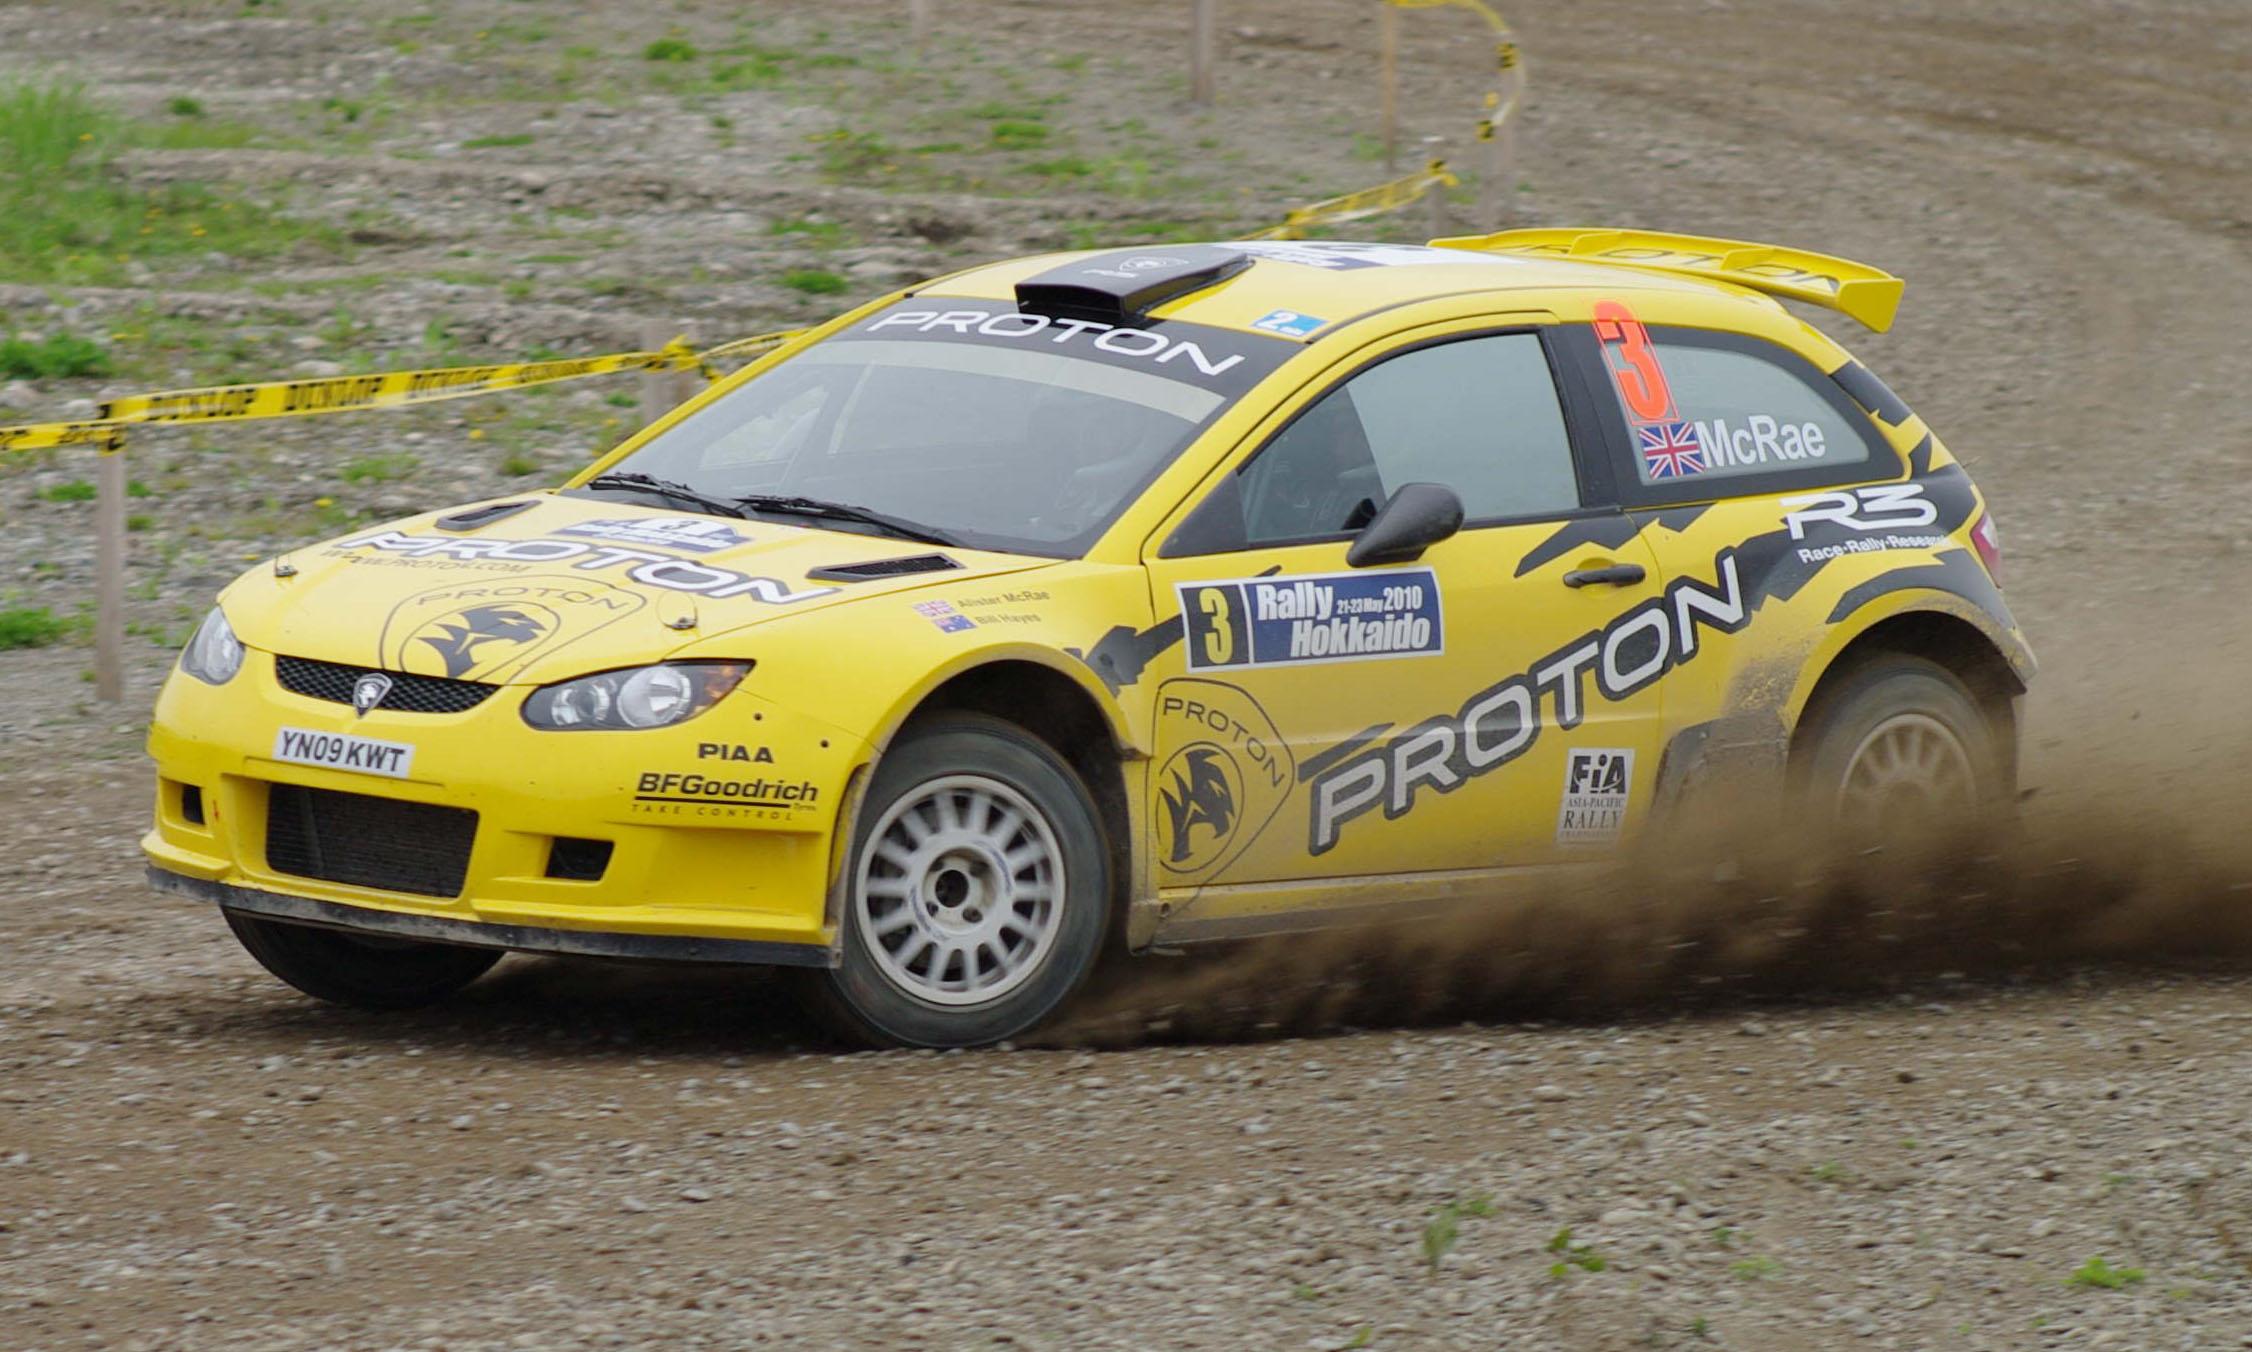 File:Proton Satria Neo Super 2000 Rally Car 2010.jpg - Wikimedia Commons